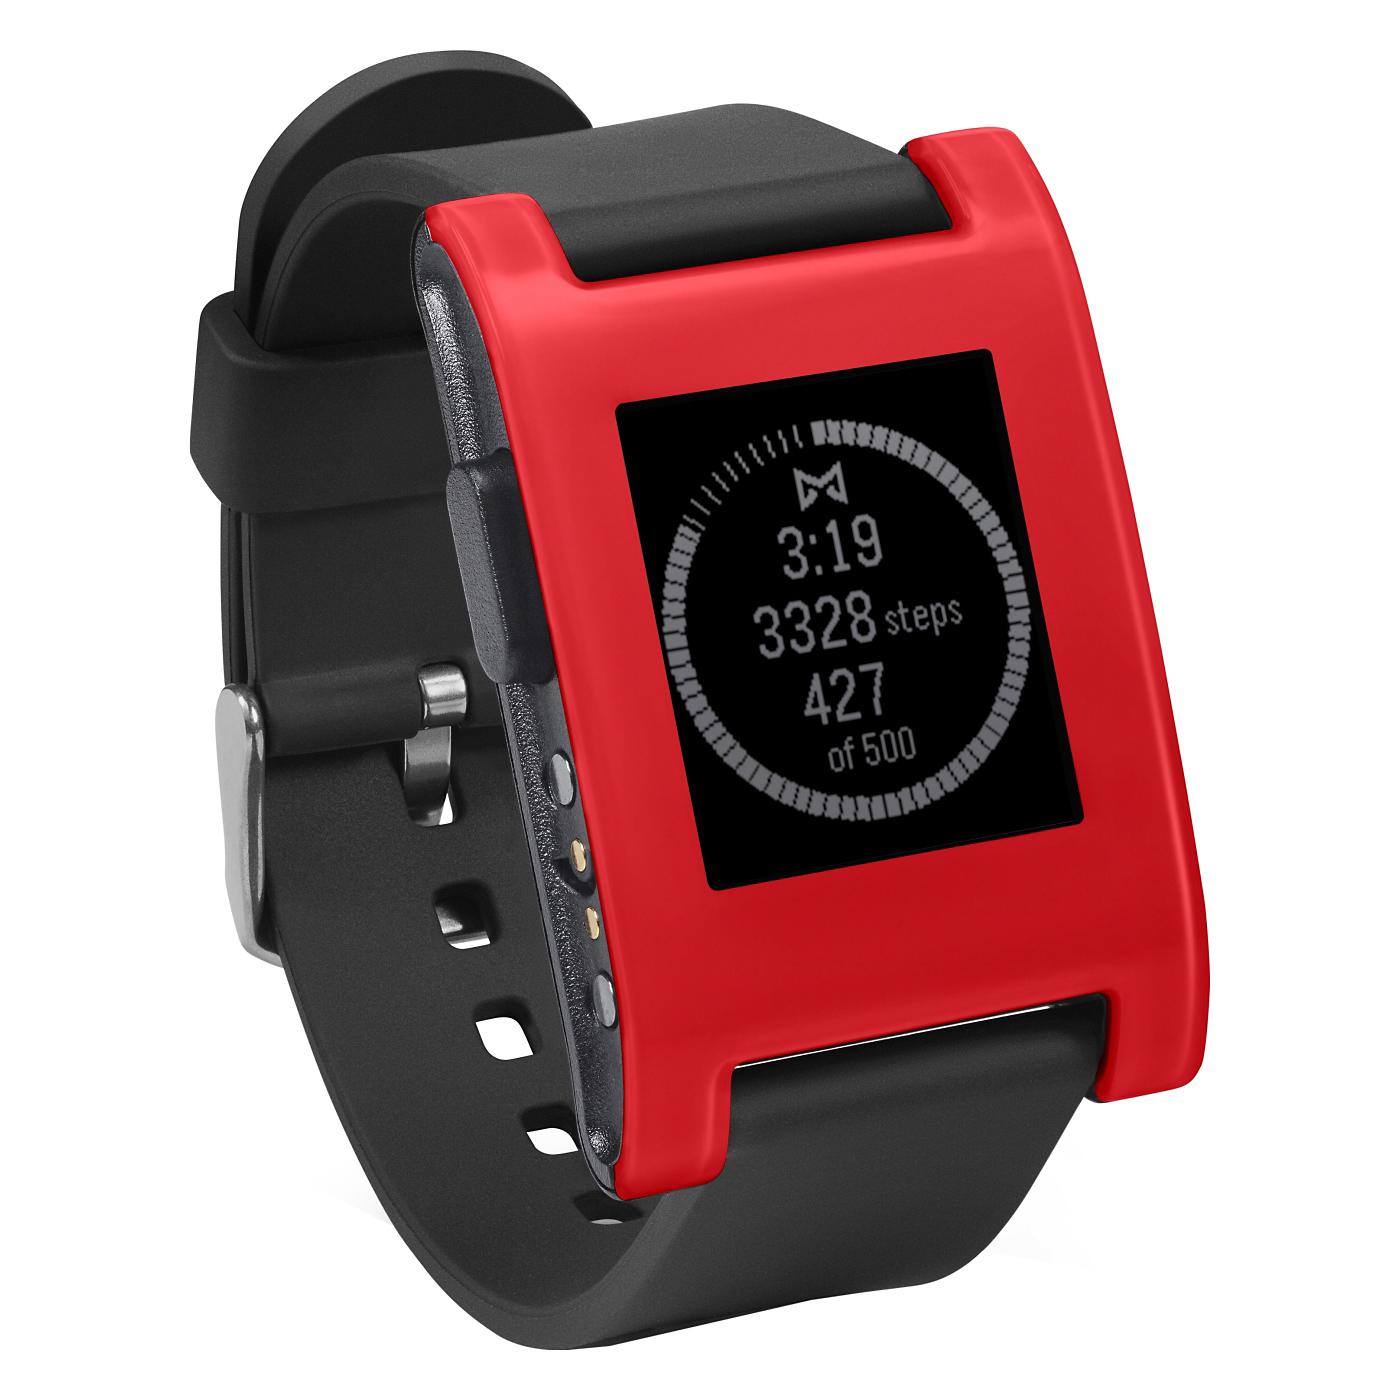 Pebble Red Pebble Smartwatch